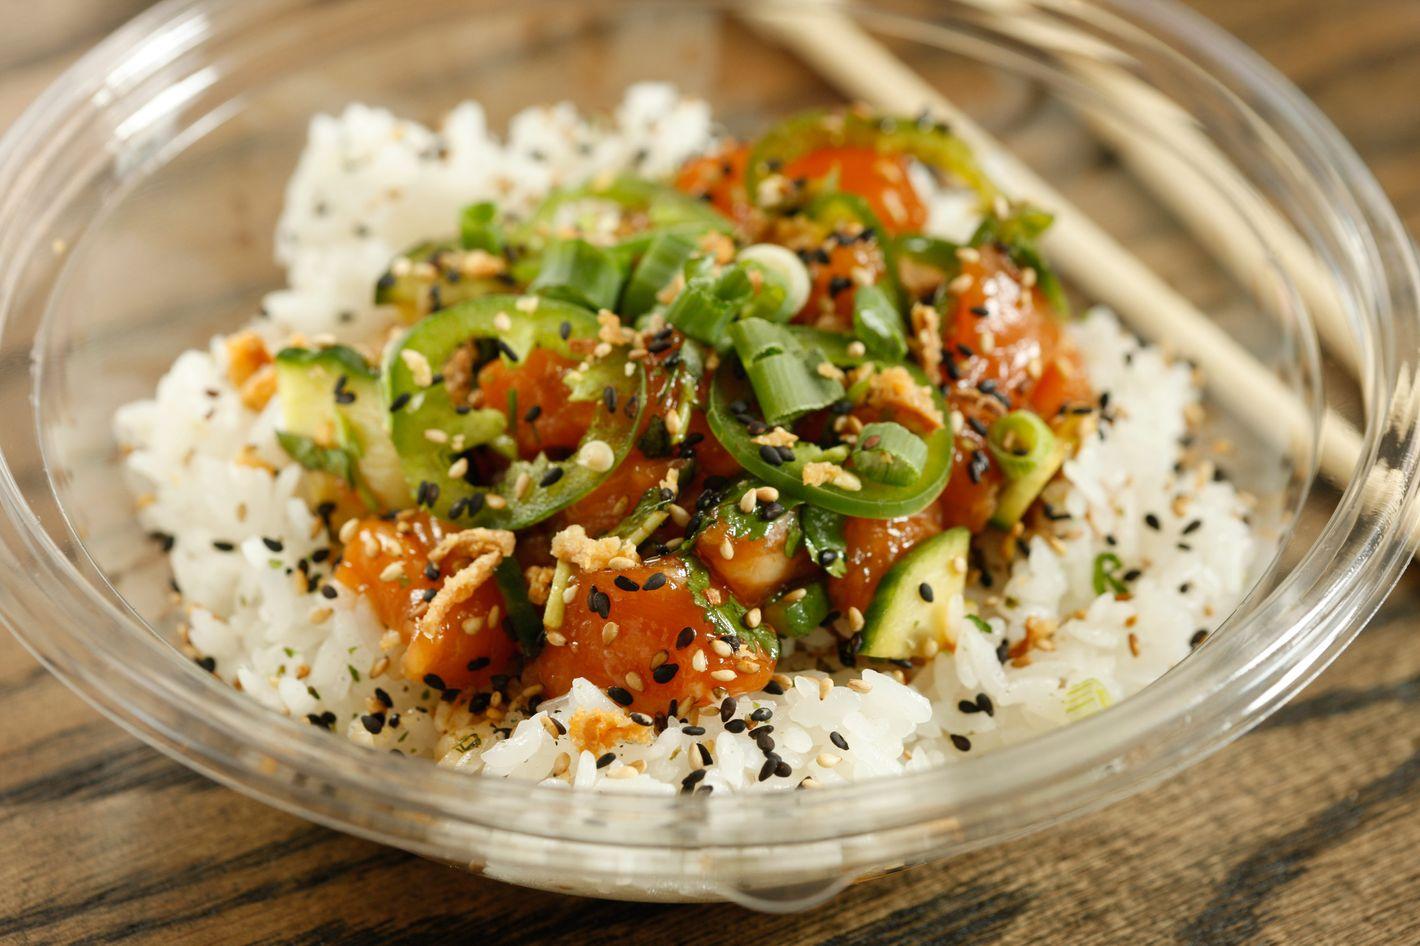 Heat Wave over white rice: salmon, cucumber, jalapeños, scallions, herb mix, spicy citrus, shoyu.